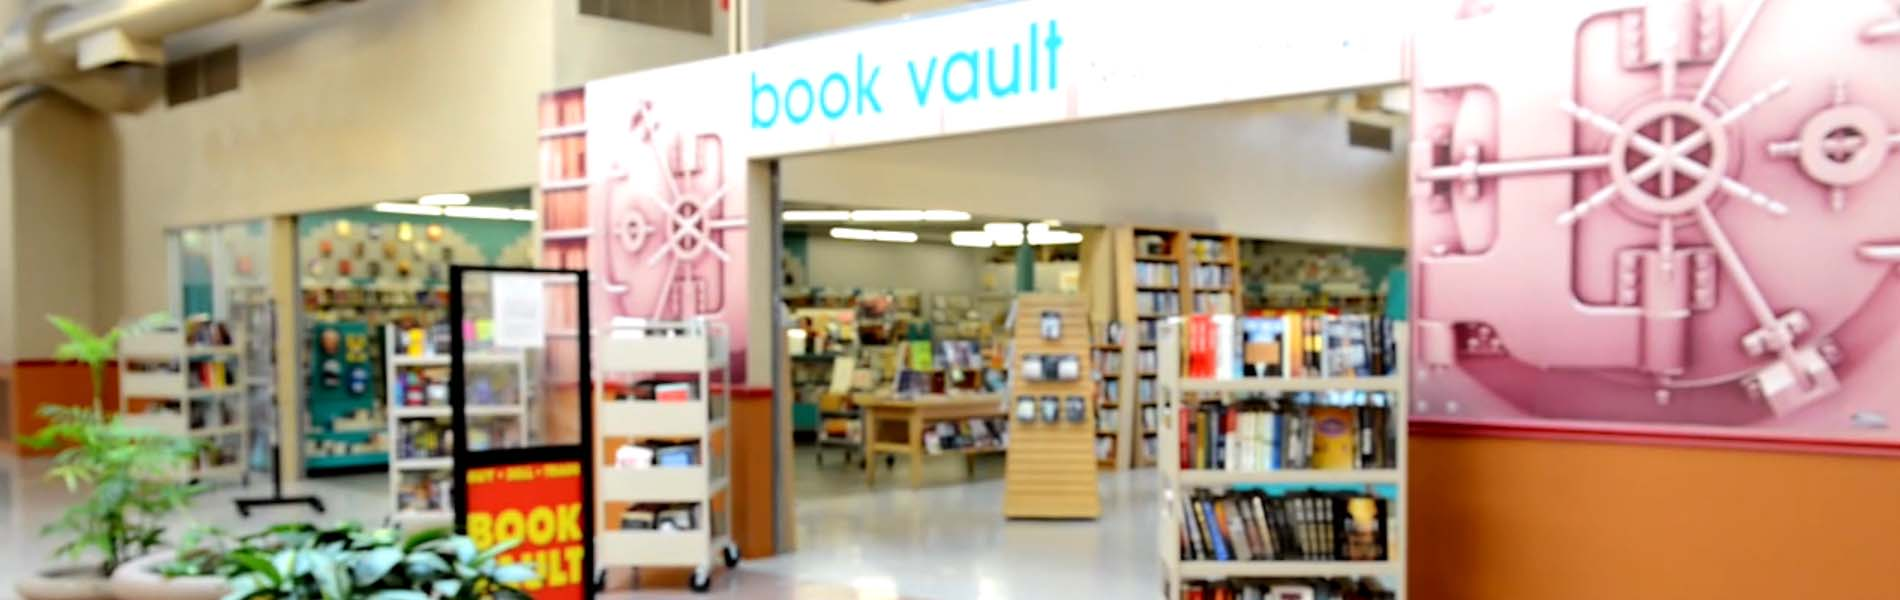 book-vault-slide